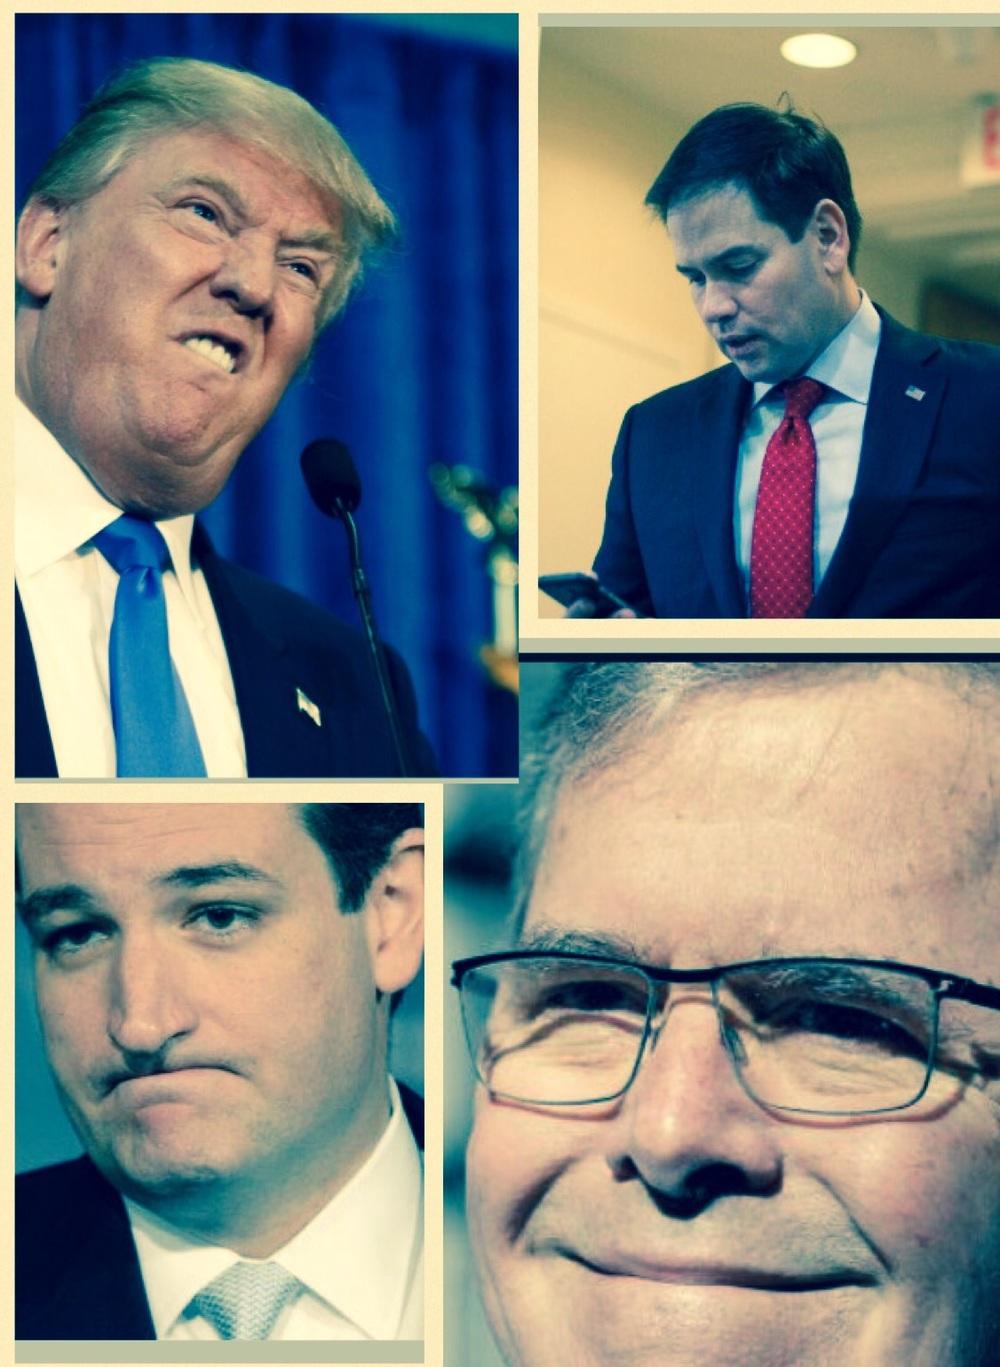 Clockwise from top left: Trump, Rubio, Bush, Cruz